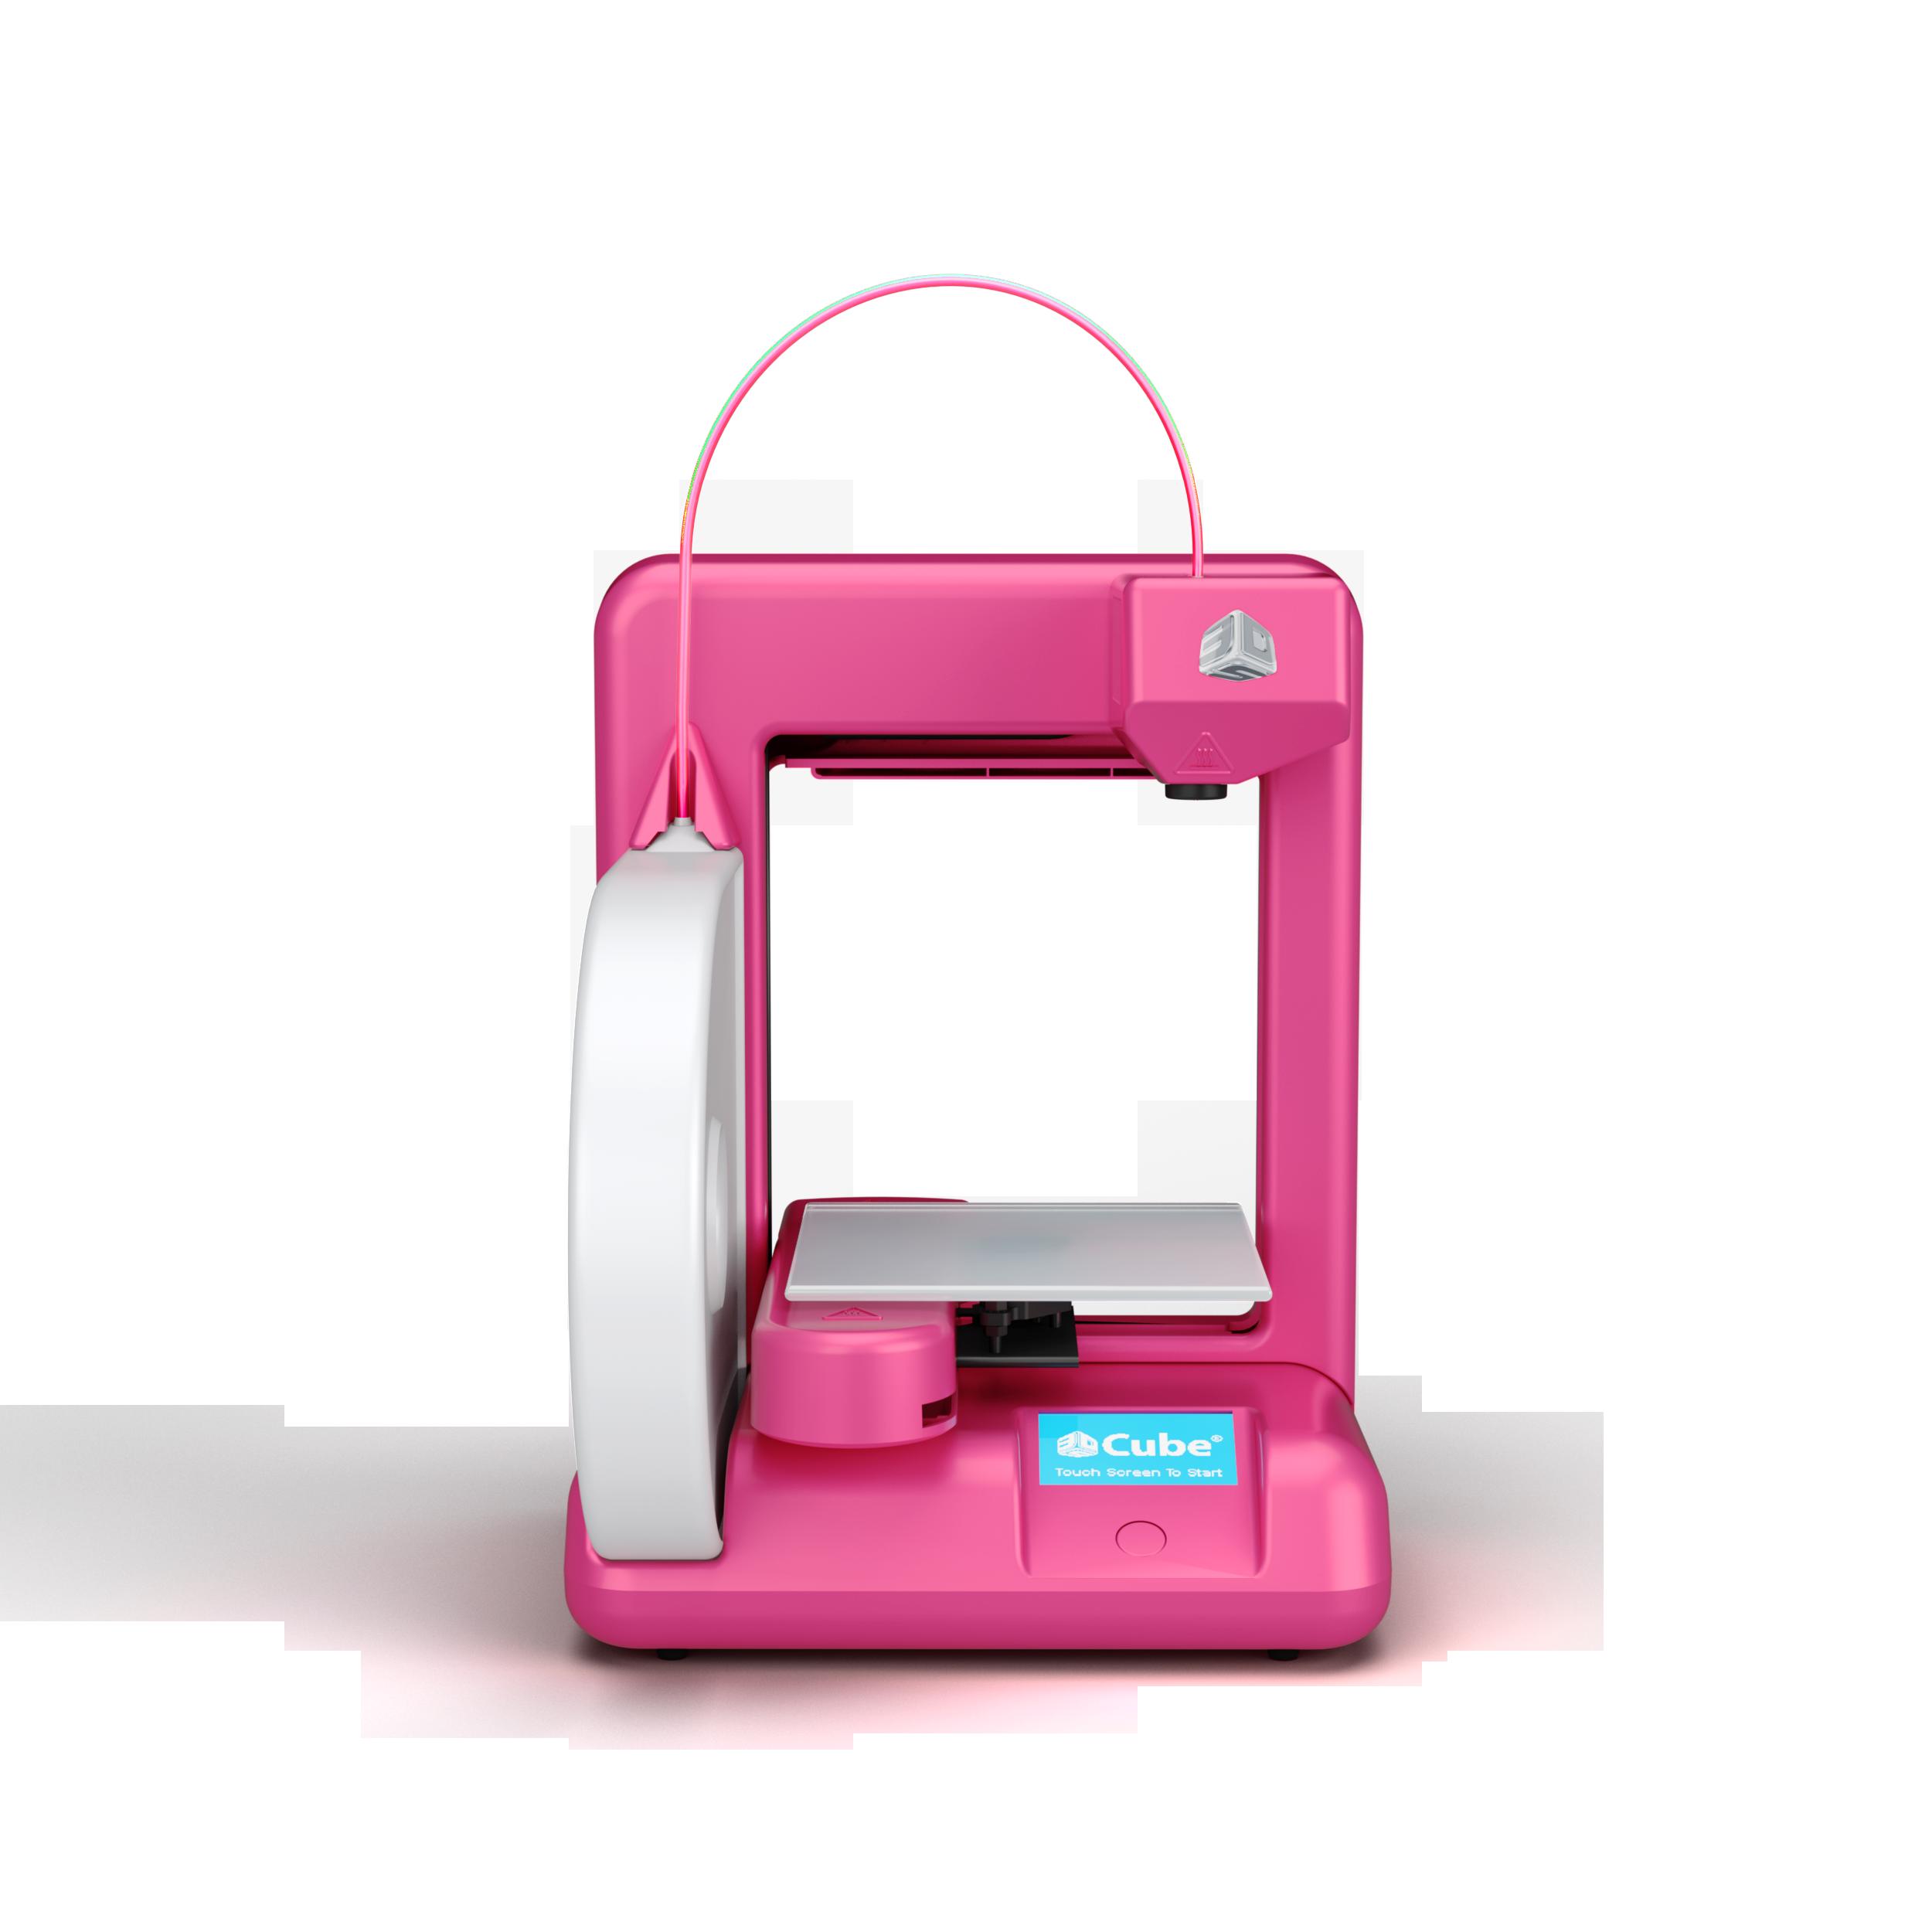 Magenta Cube2 3D printer